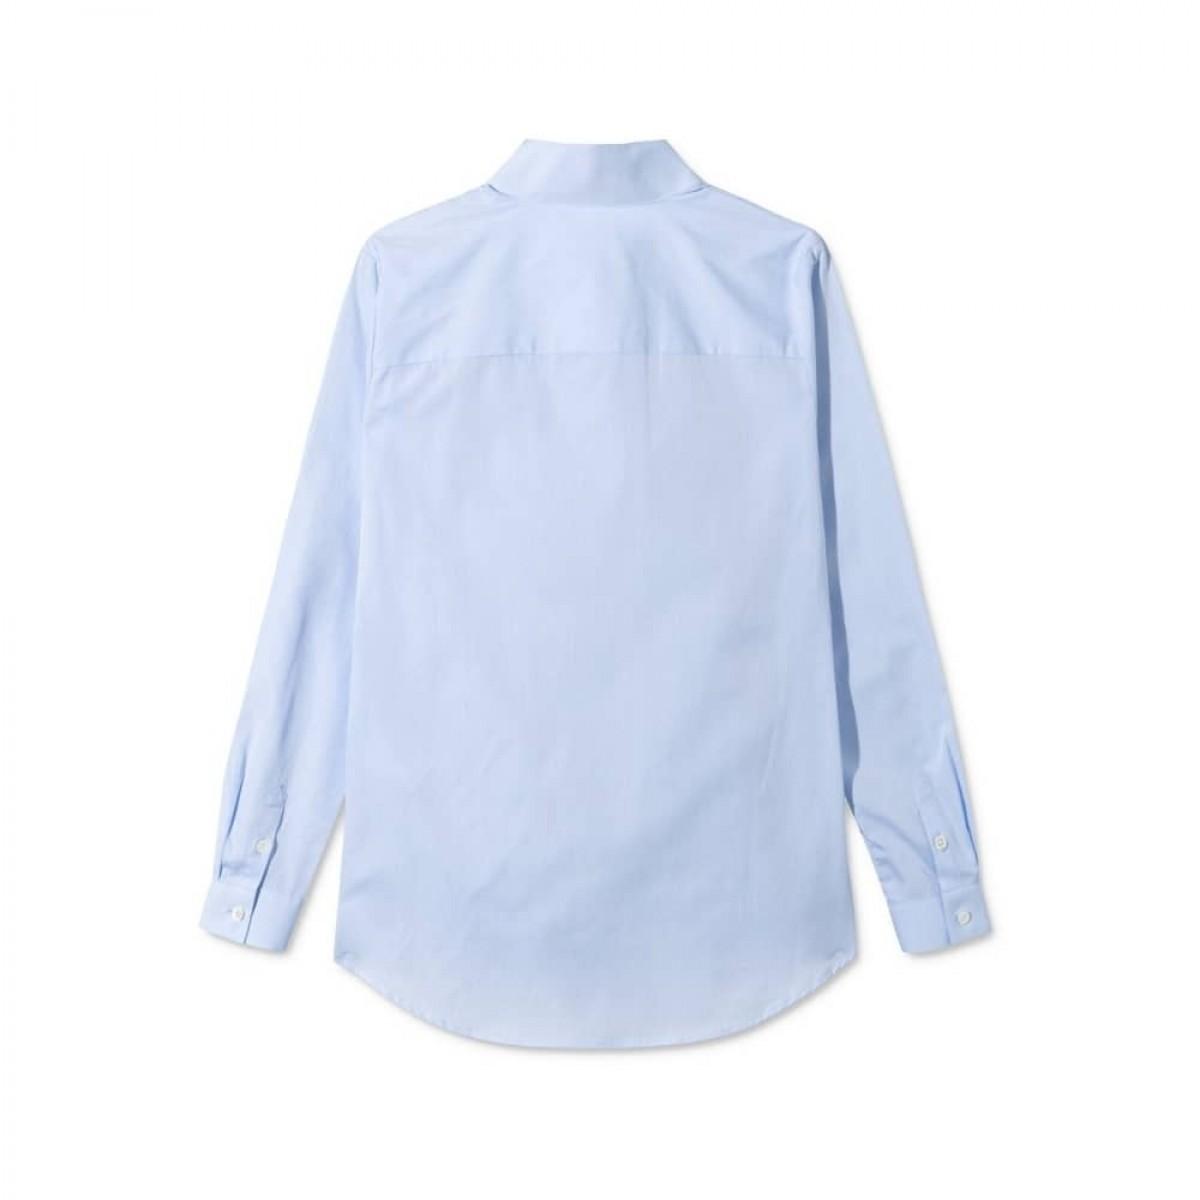 sera skjorte - light blue - ryggen